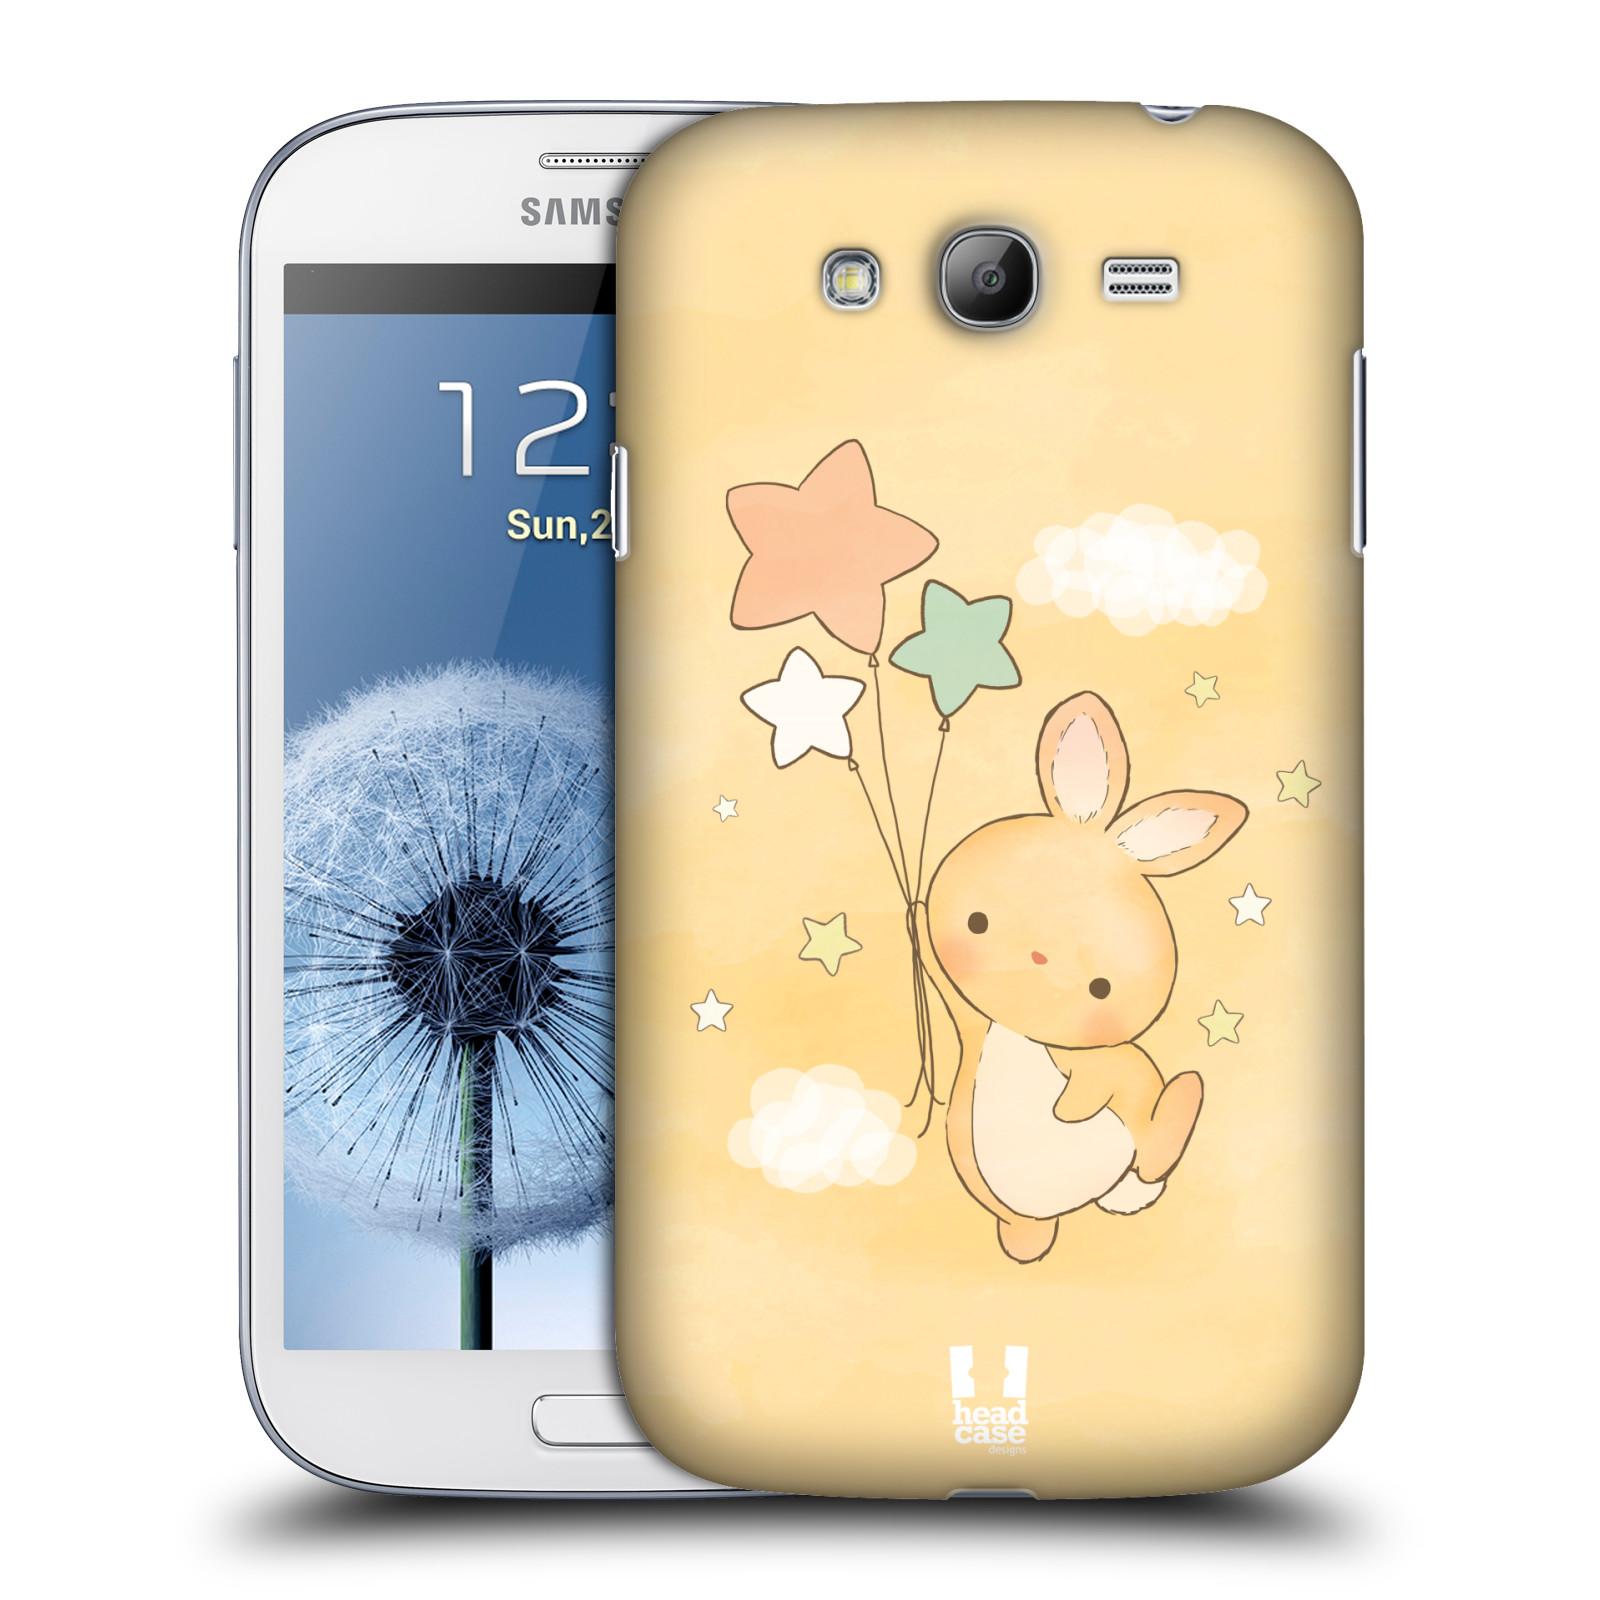 HEAD CASE plastový obal na mobil SAMSUNG GALAXY Grand i9080 vzor králíček a hvězdy žlutá